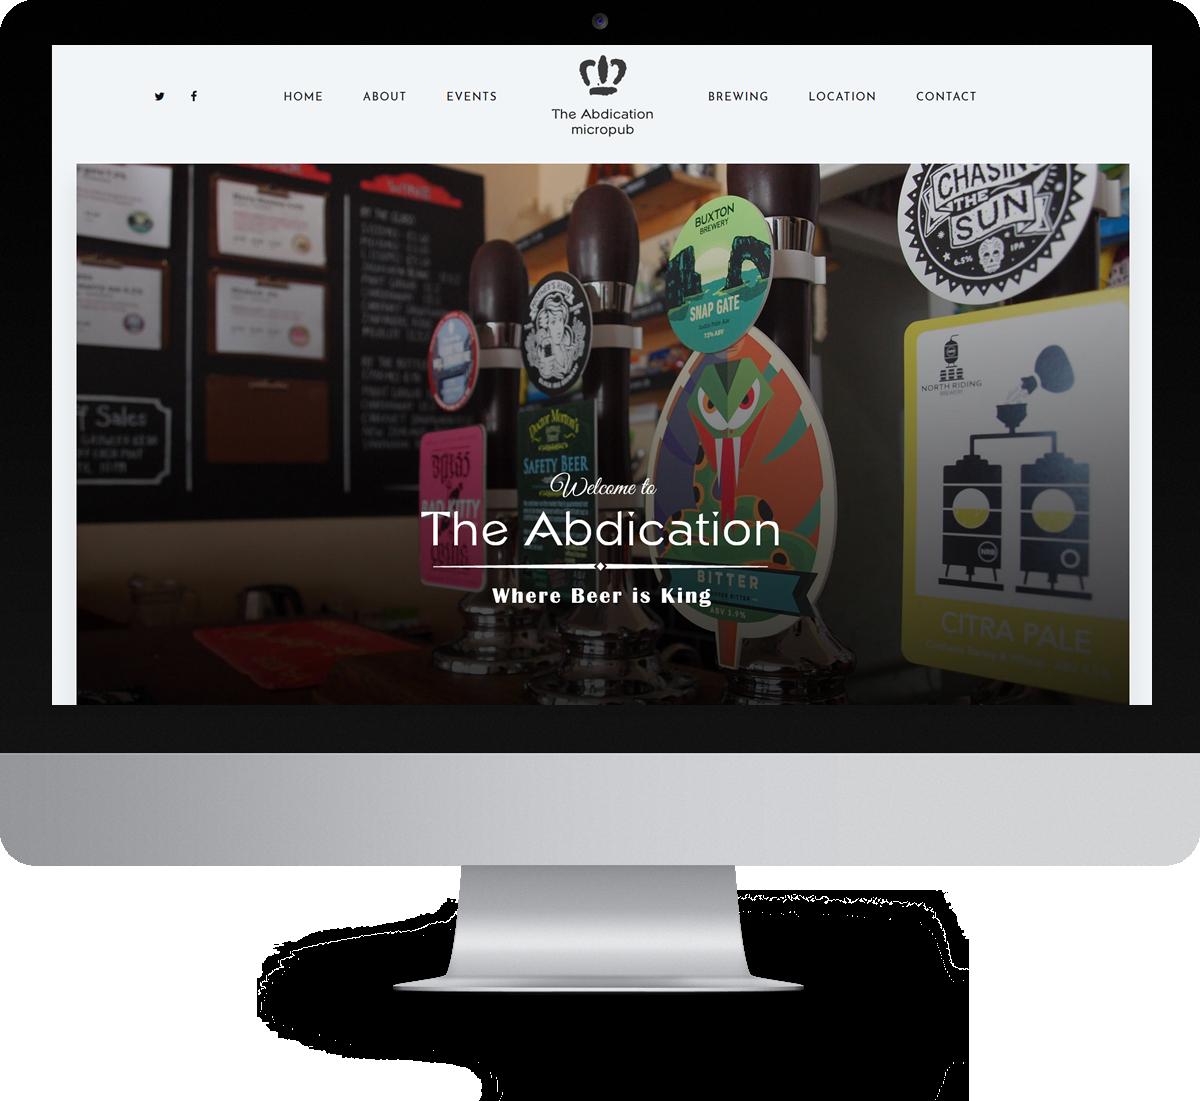 The Abdication Micropub website